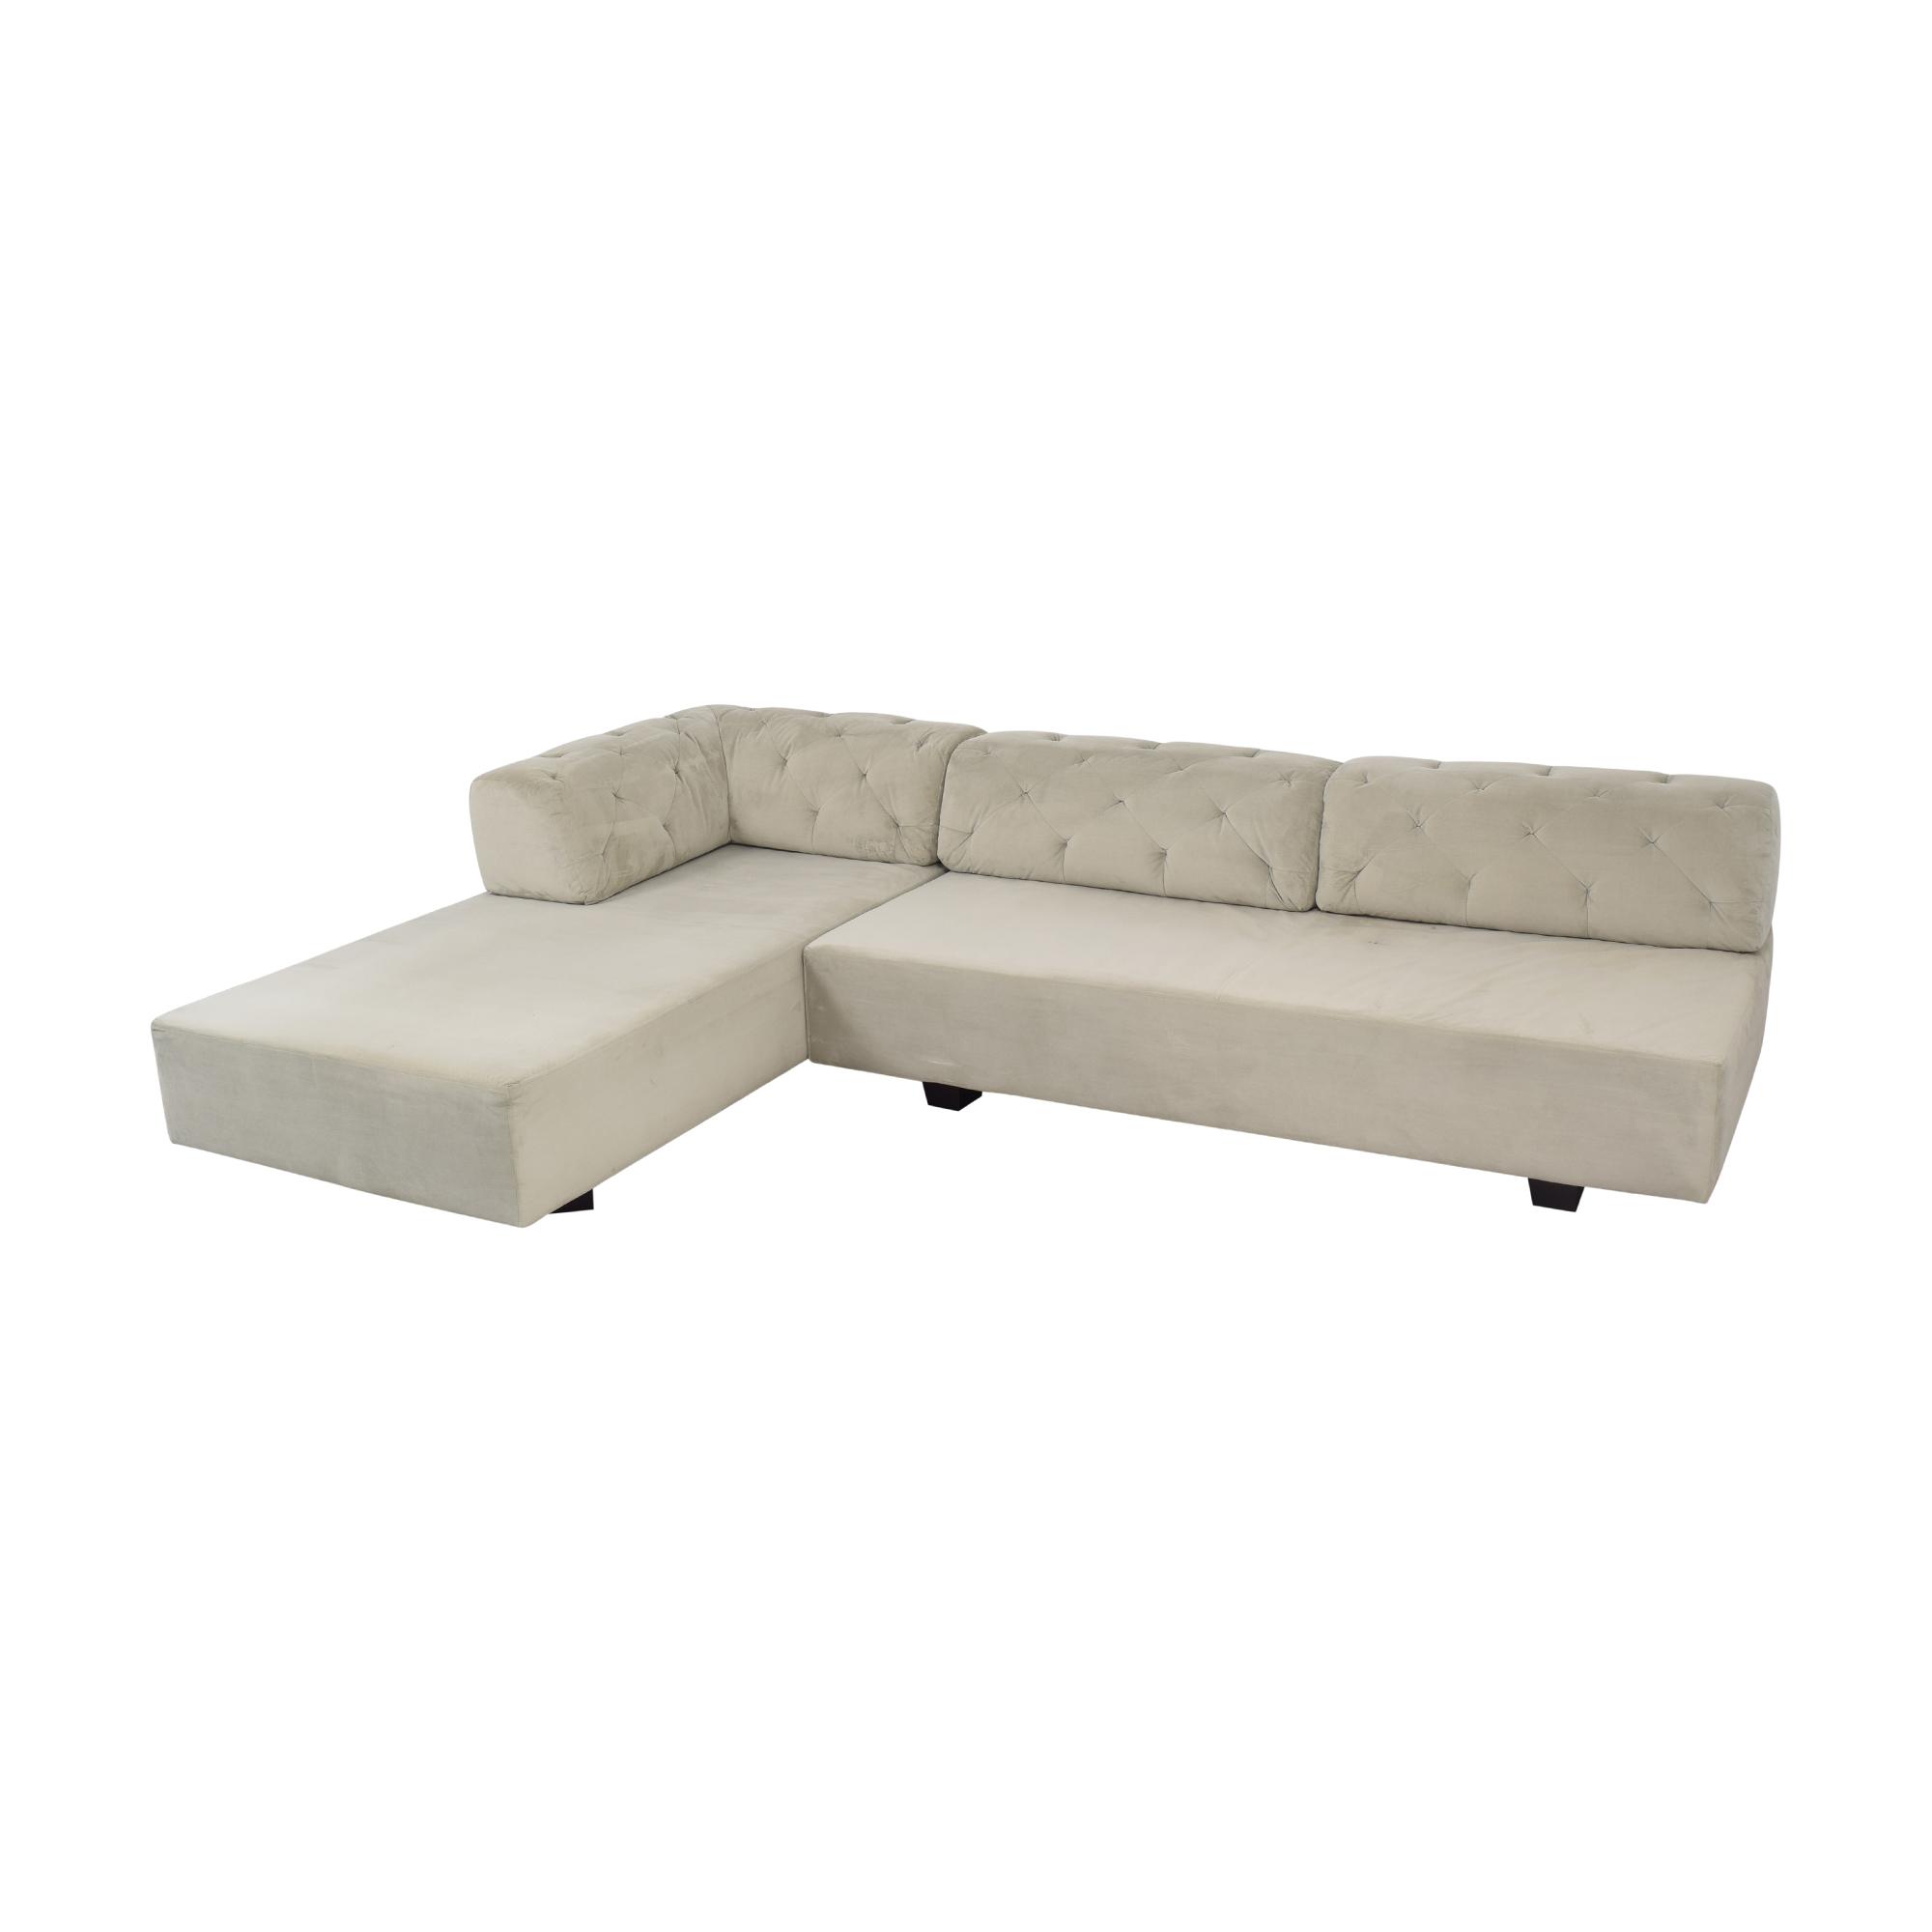 West Elm West Elm Tillary Tufted Sectional Sofa price